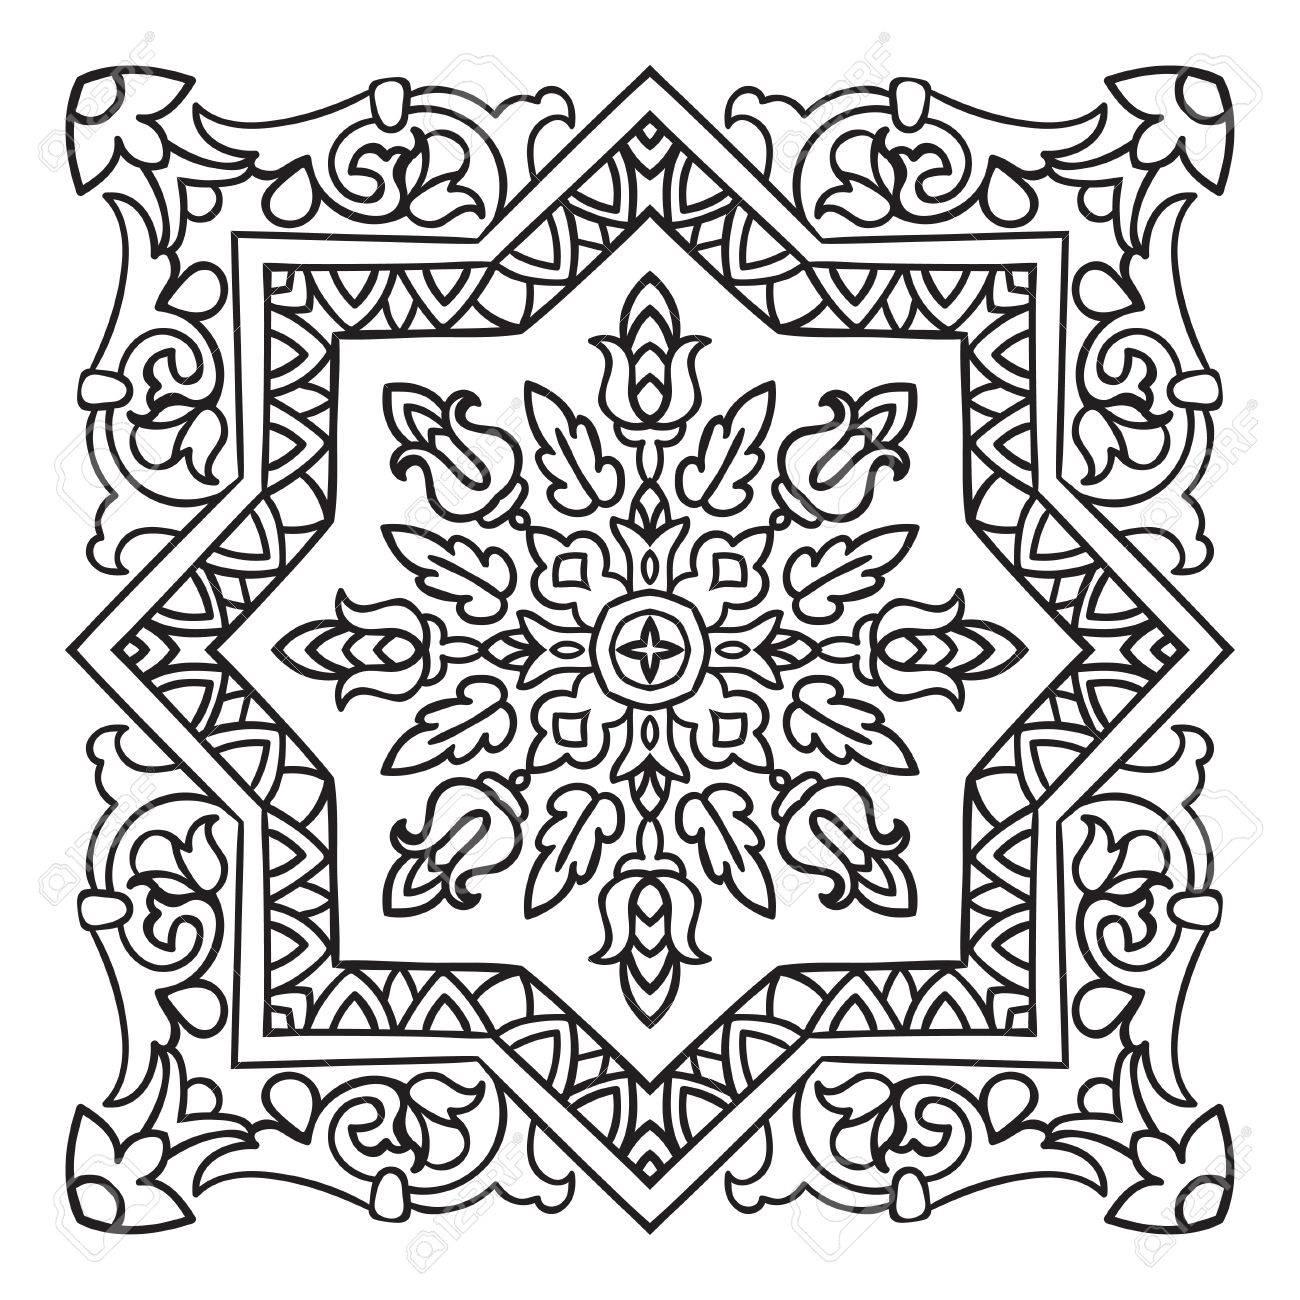 1300x1300 Hand Drawing Zentangle Element. Italian Majolica Style Black